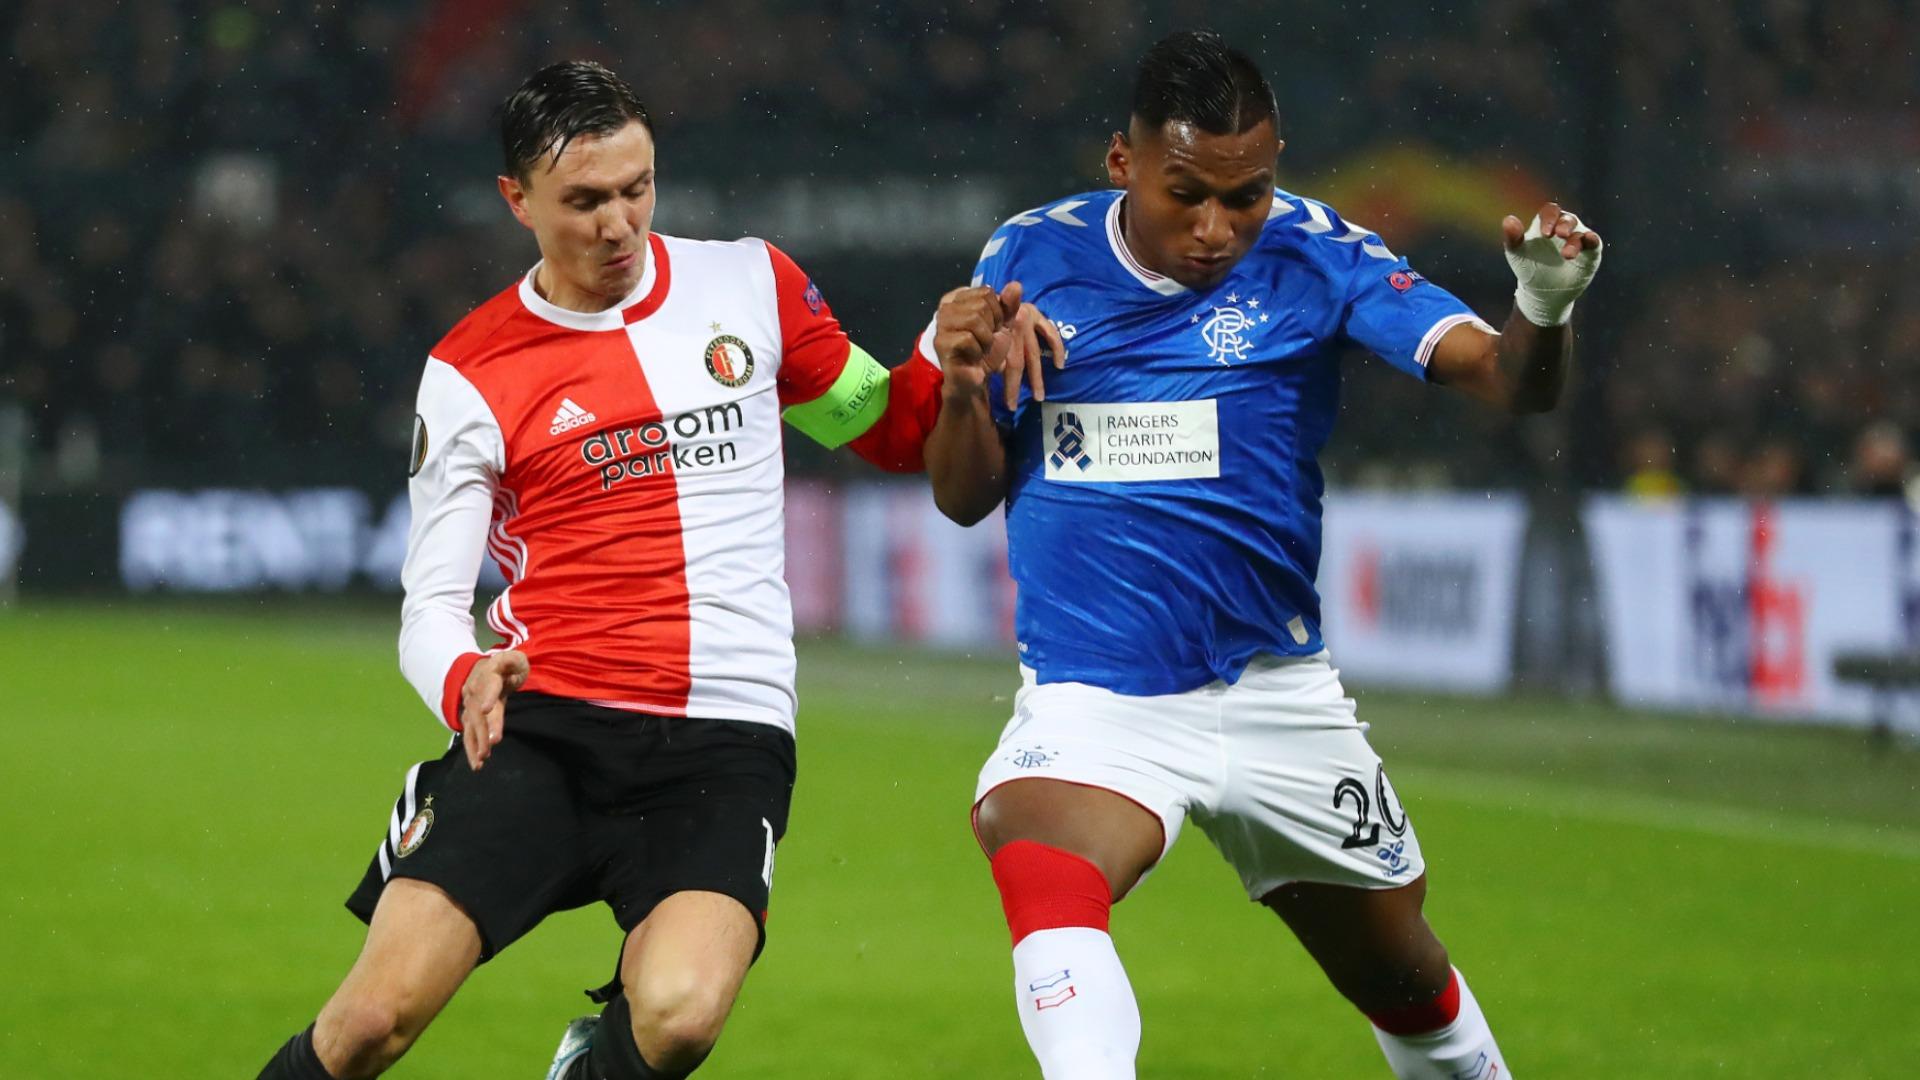 Feyenoord 2-2 Rangers: Morelos makes history but Gerrard's men a point away